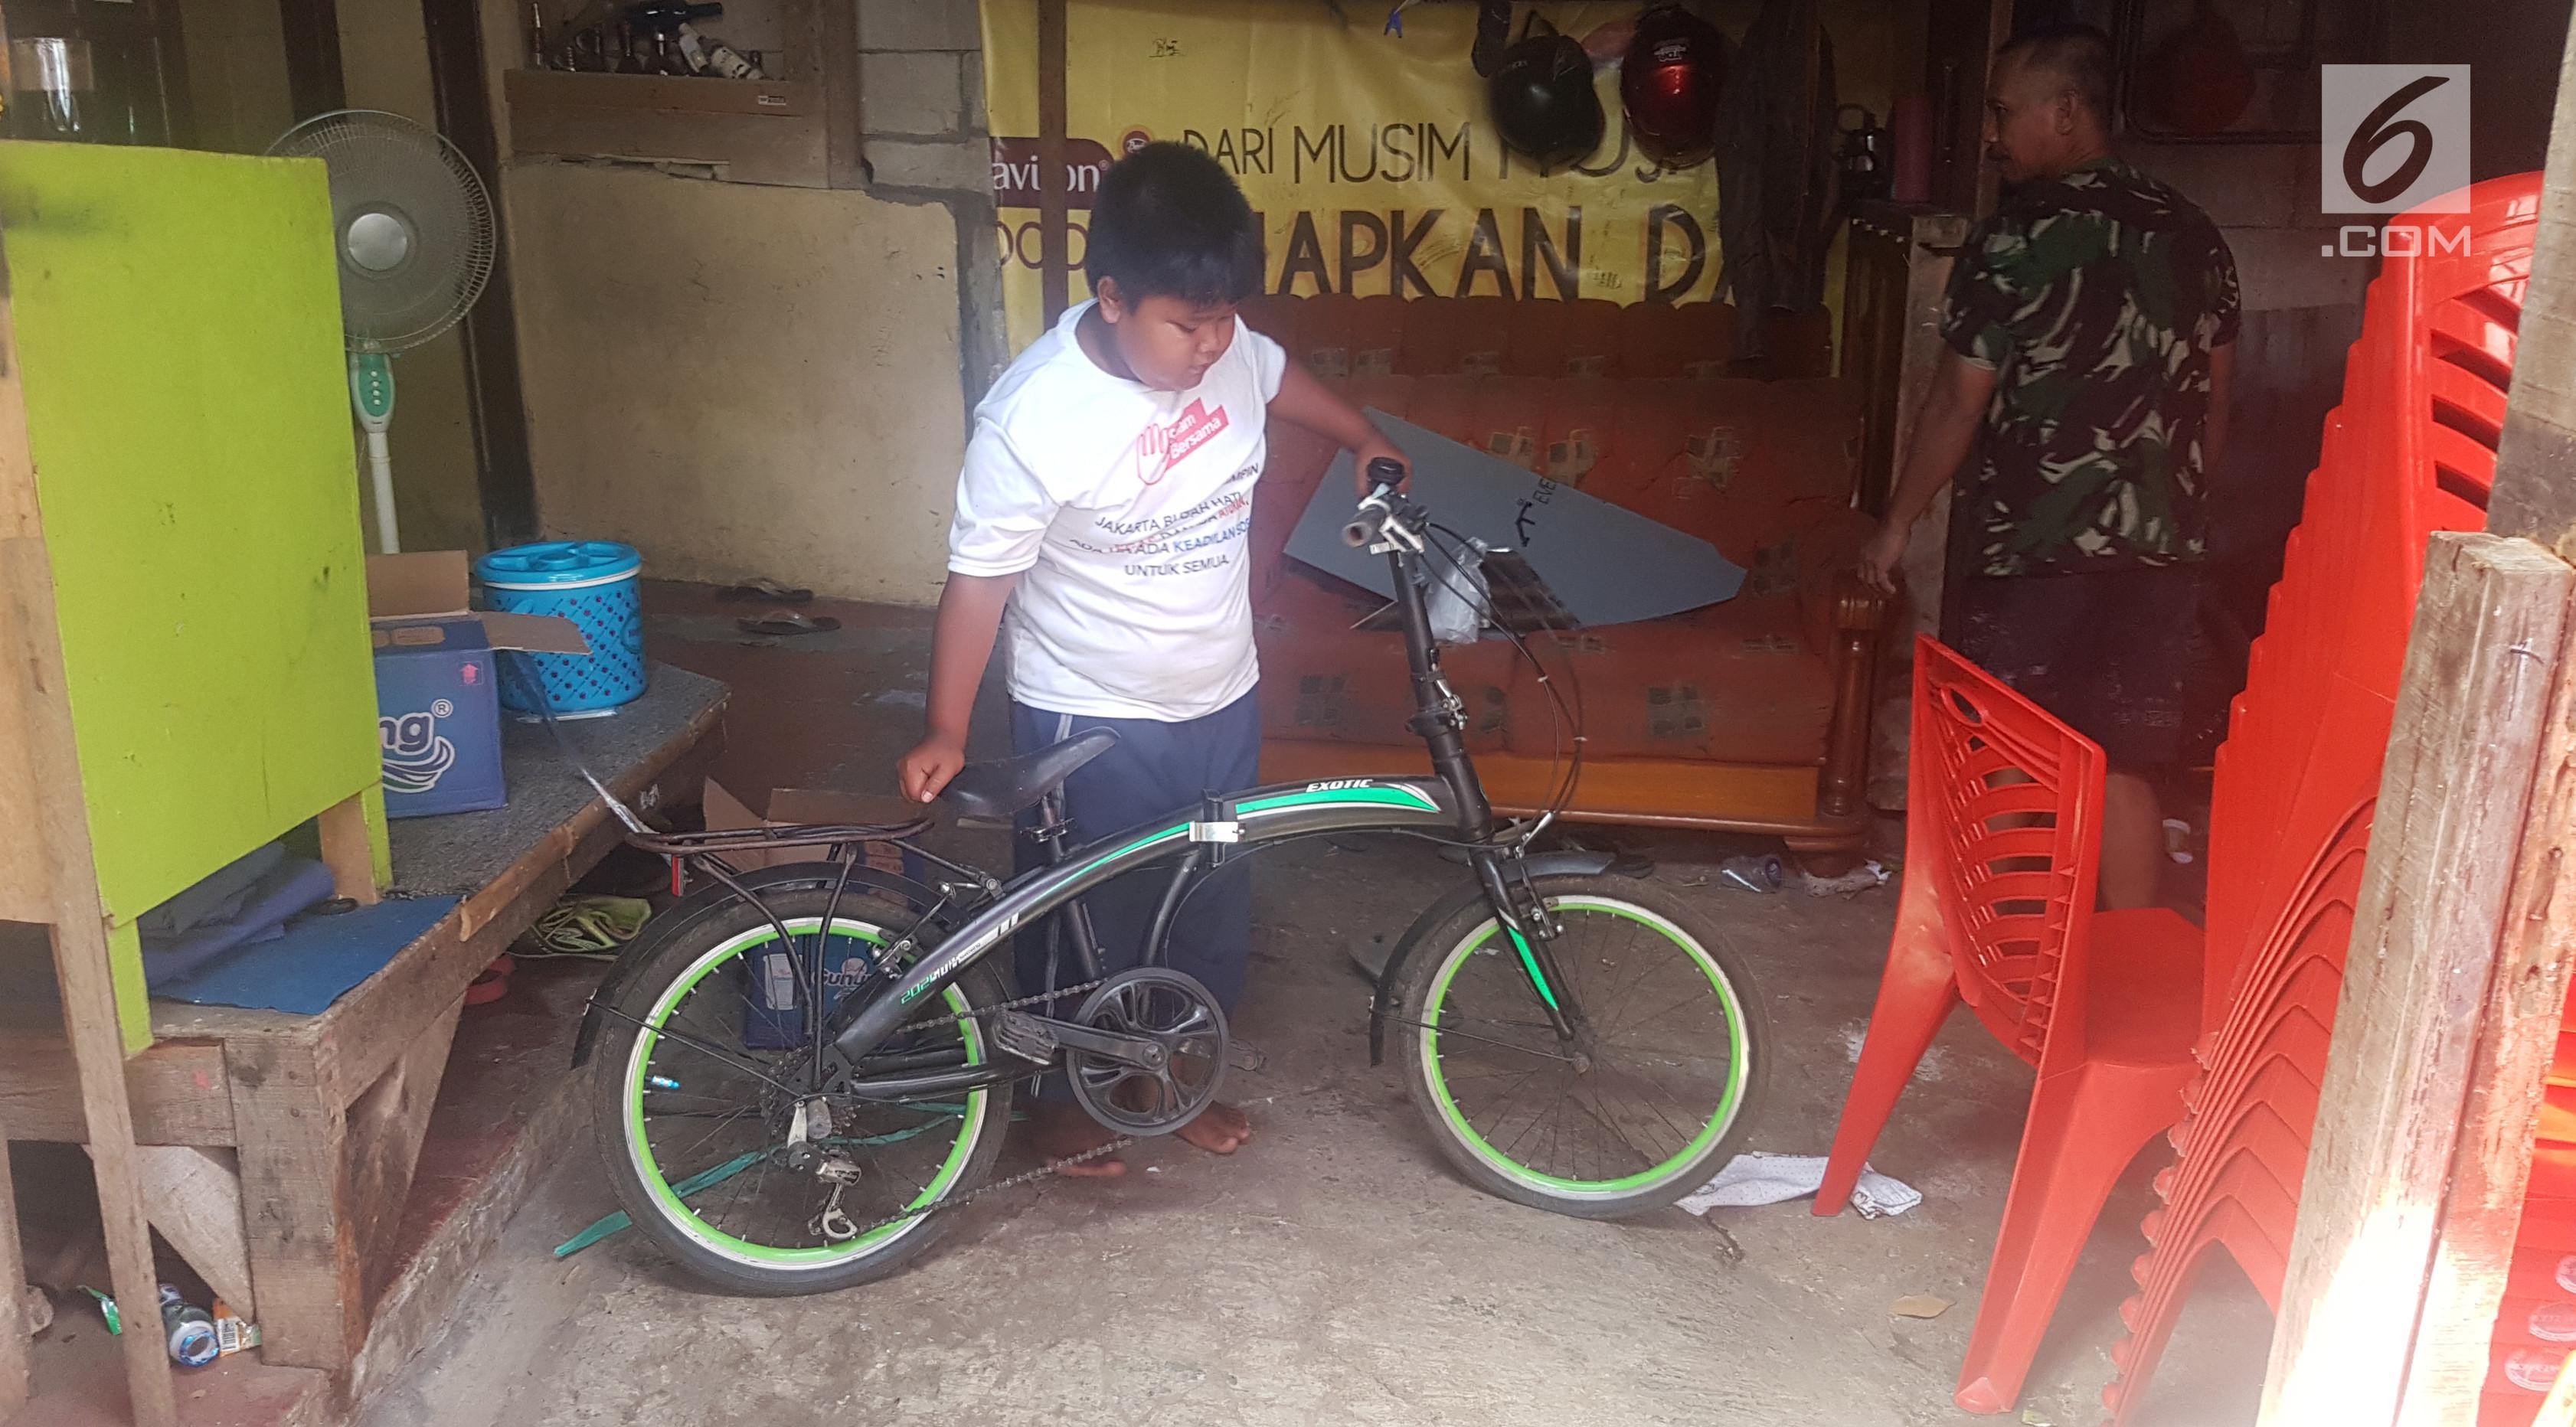 Fadli yang Berjualan Donat Kentang Setelah Pulang Sekolah Ini Memperlihatkan Sepeda yang Diberikan Deddy Corbuzier (Liputan6.com/Aditya Eka Prawira)